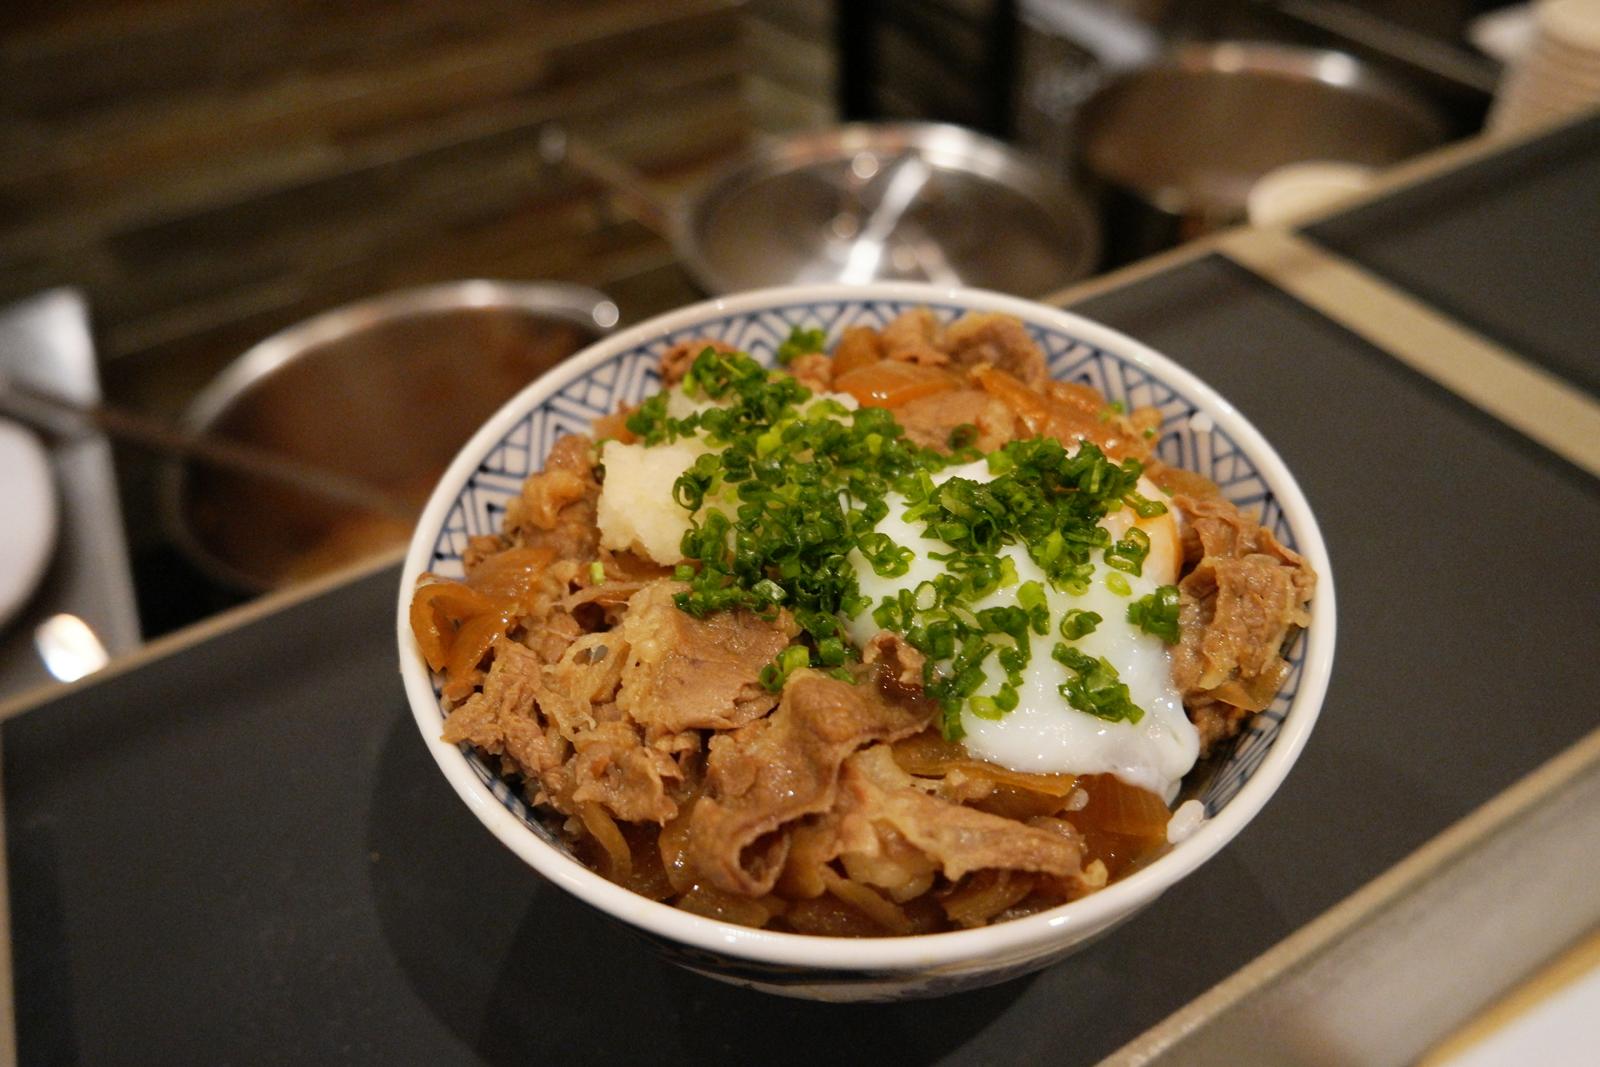 Guydon bol de riz chaud avec bouillon parfumé avec viande Restaurant japonais Oishinoya Paris photo usofparis blog